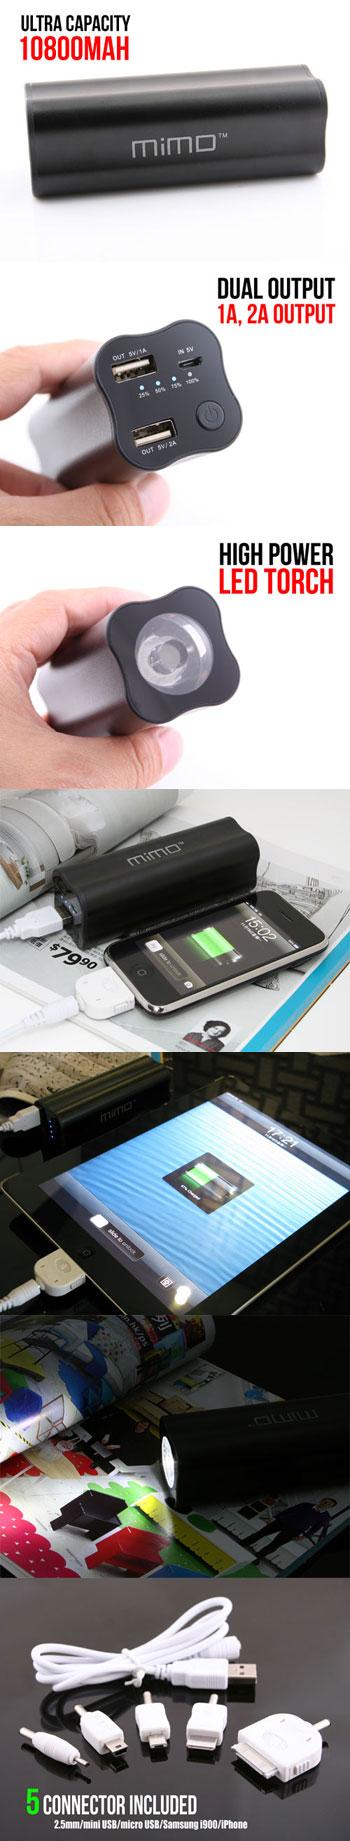 MiMO 10800mAh Power Bank  http://www.usbgeek.com/products/mimo-10800mah-power-bank